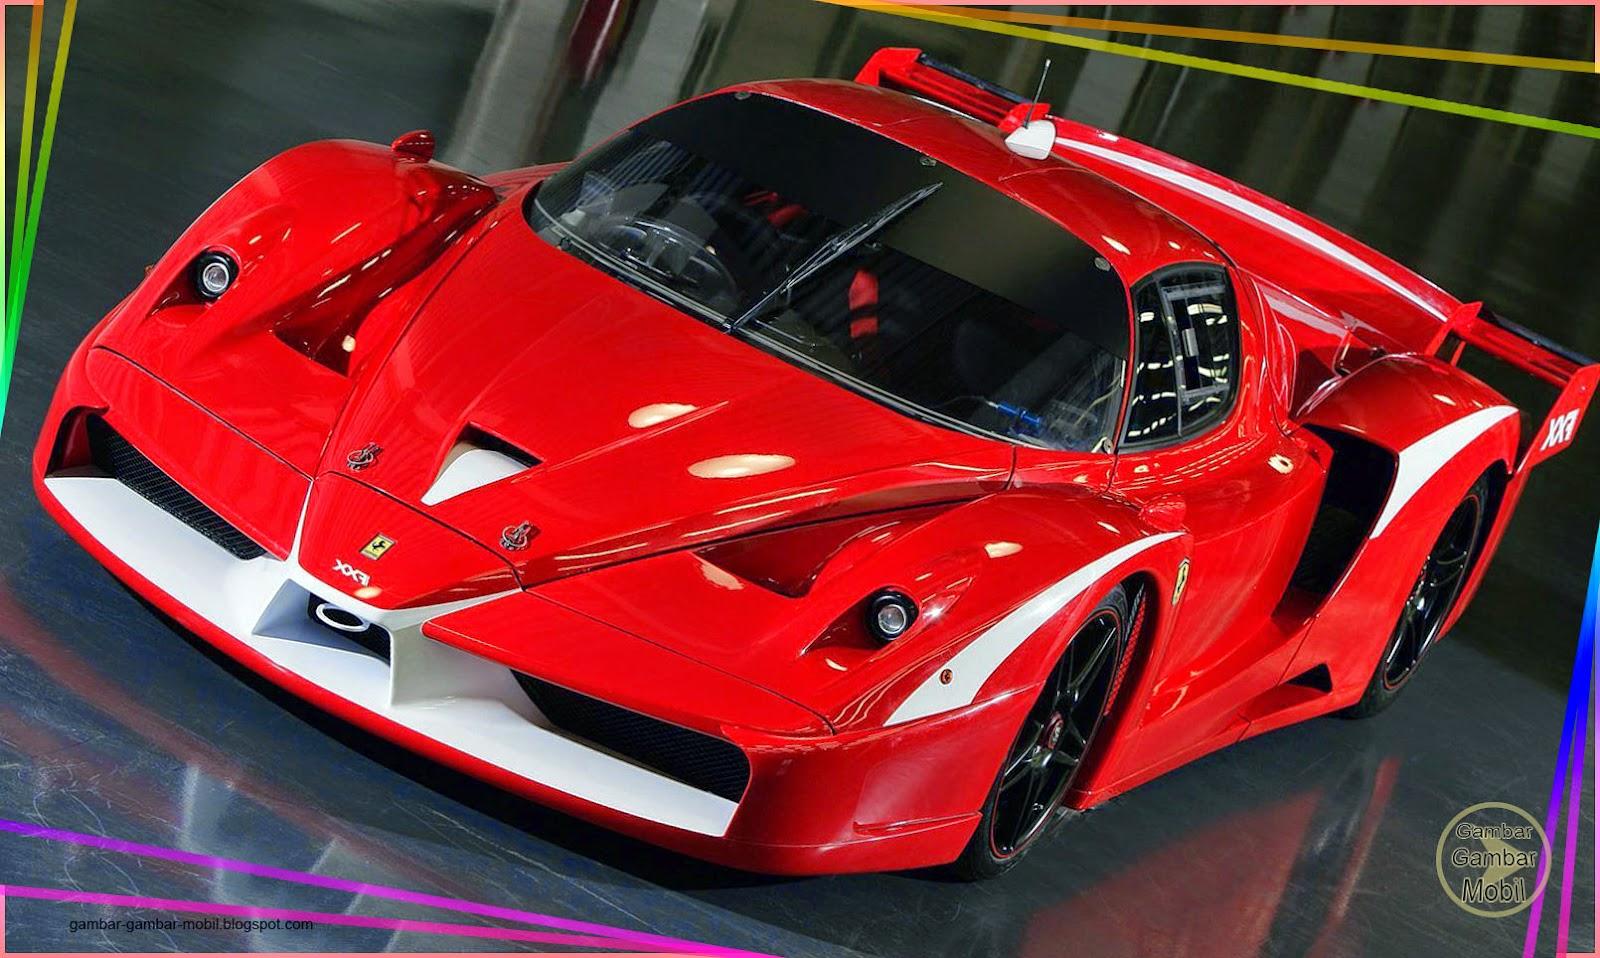 Mobil Ferrari: Gambar Mobil Ferrari